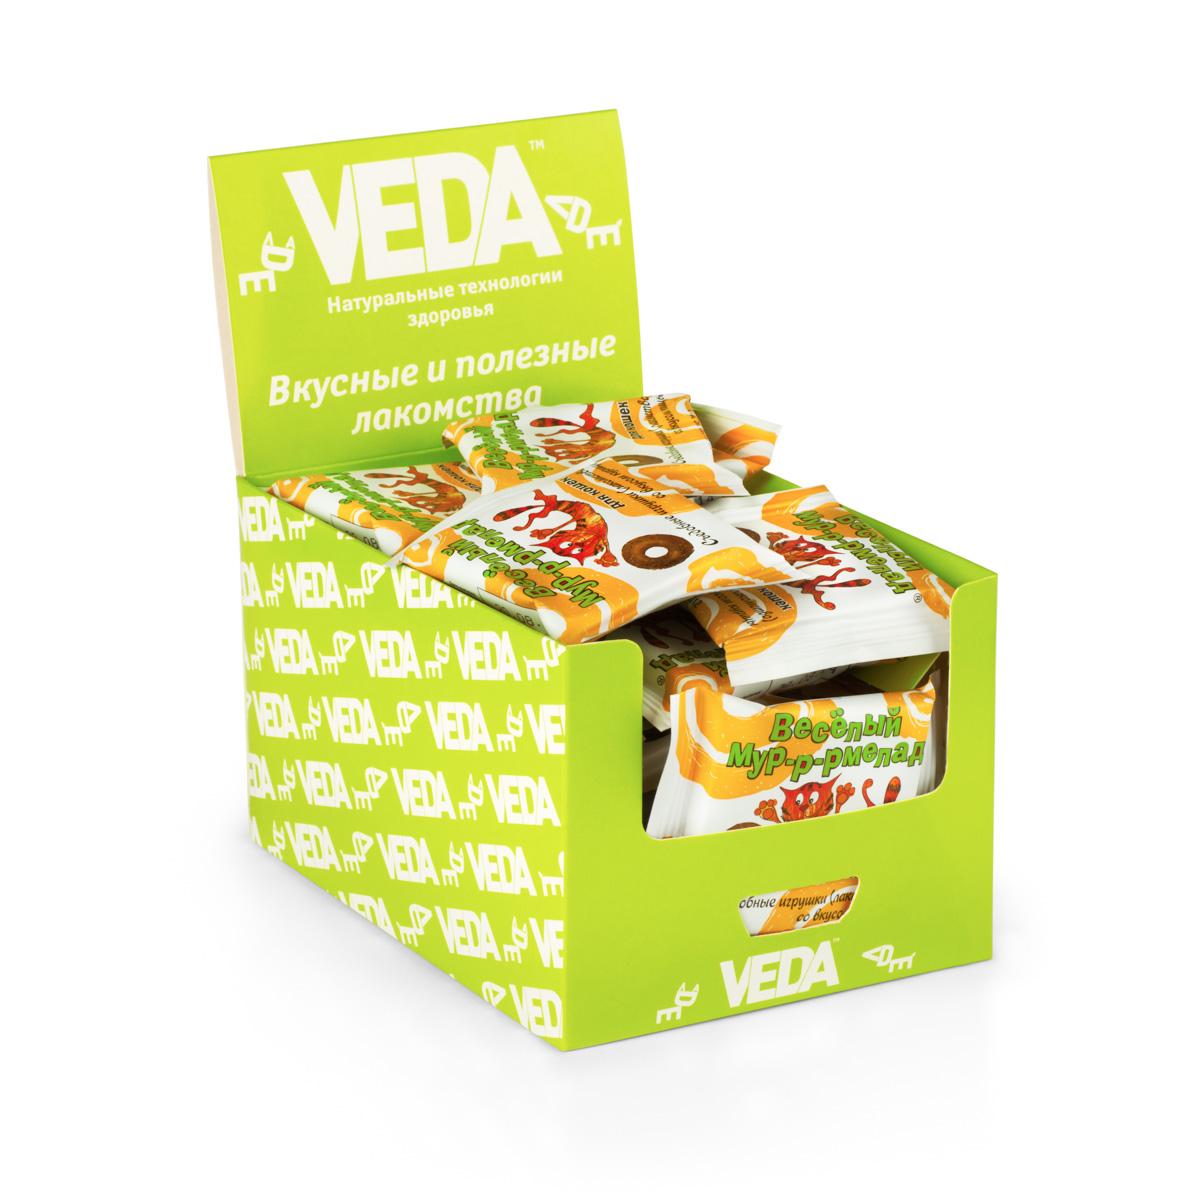 Лакомство VEDA Веселый Мур-Р-Рмелад, для кошек, в шоу-боксе, с курицей, 32 шт лакомство для кошек veda веселый мур р рмелад со вкусом курицы 7 г